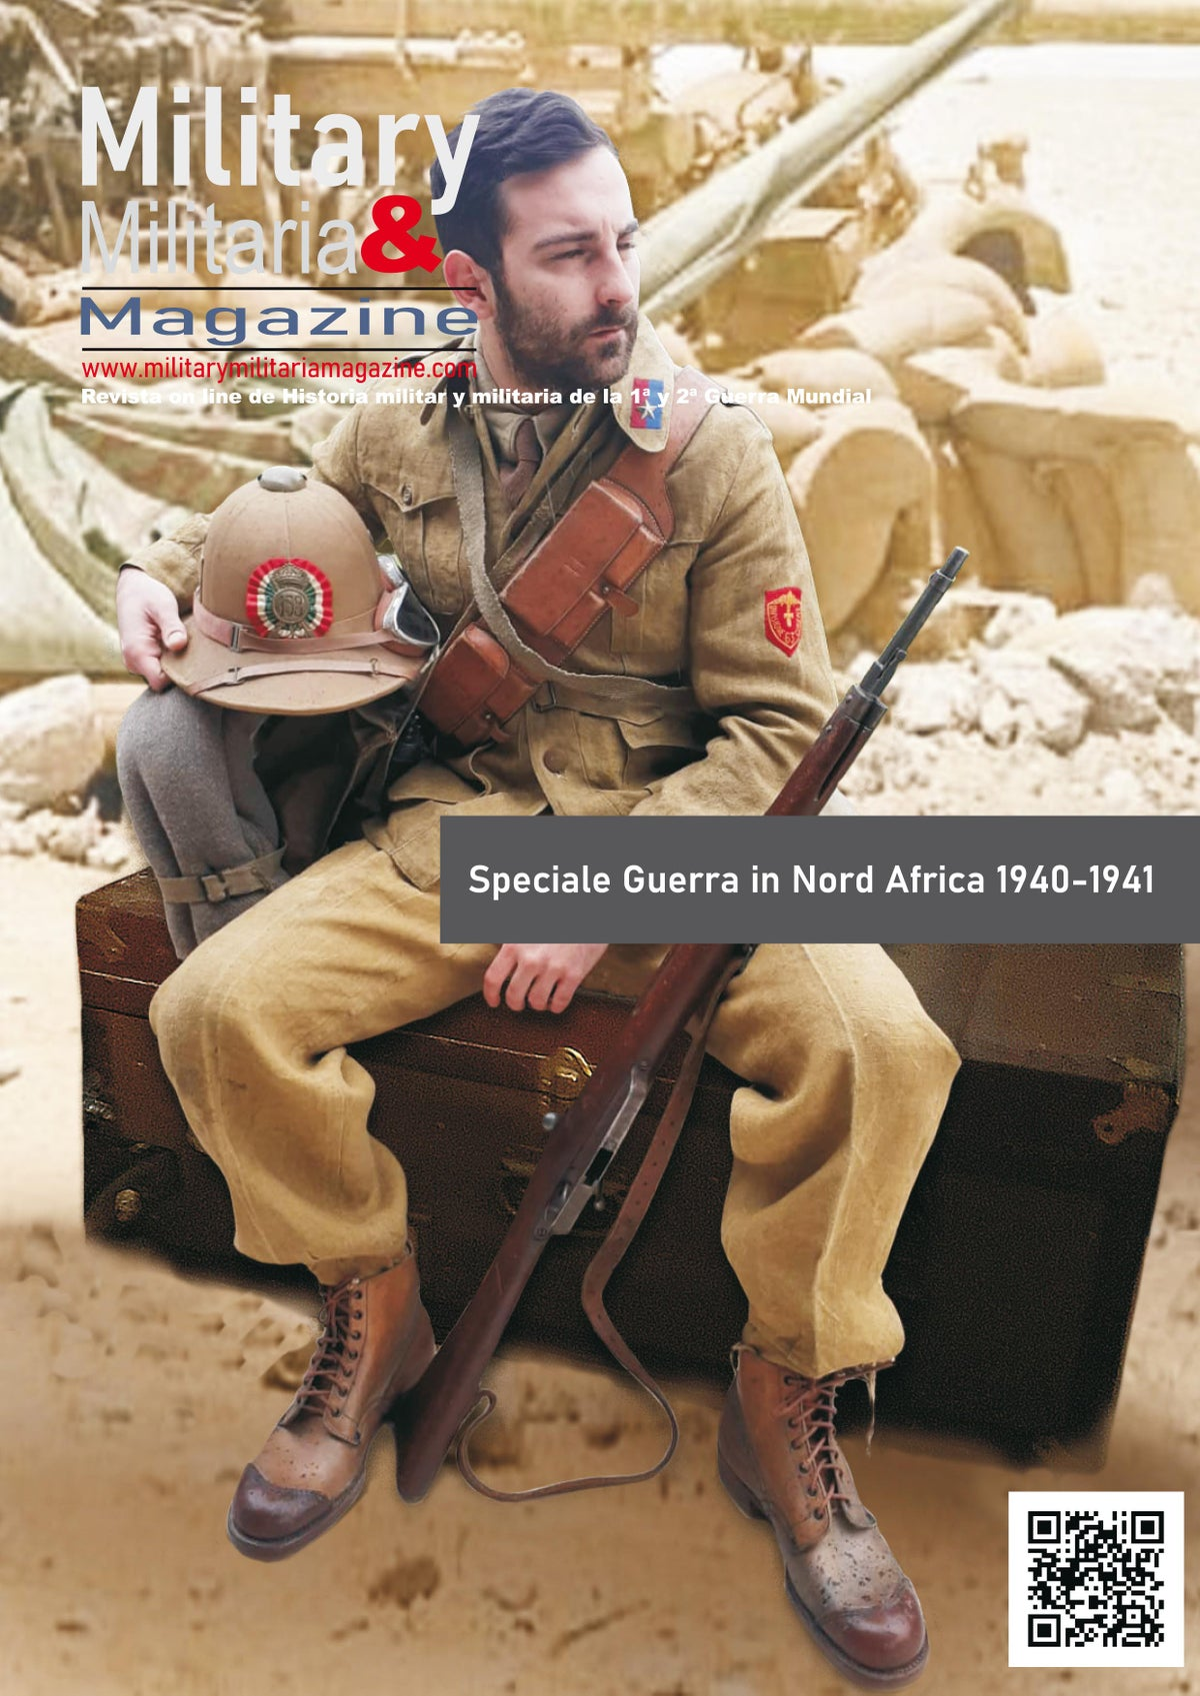 Military & Militaria Numero Speciale Guerra in Nord Africa 1940 - 1941